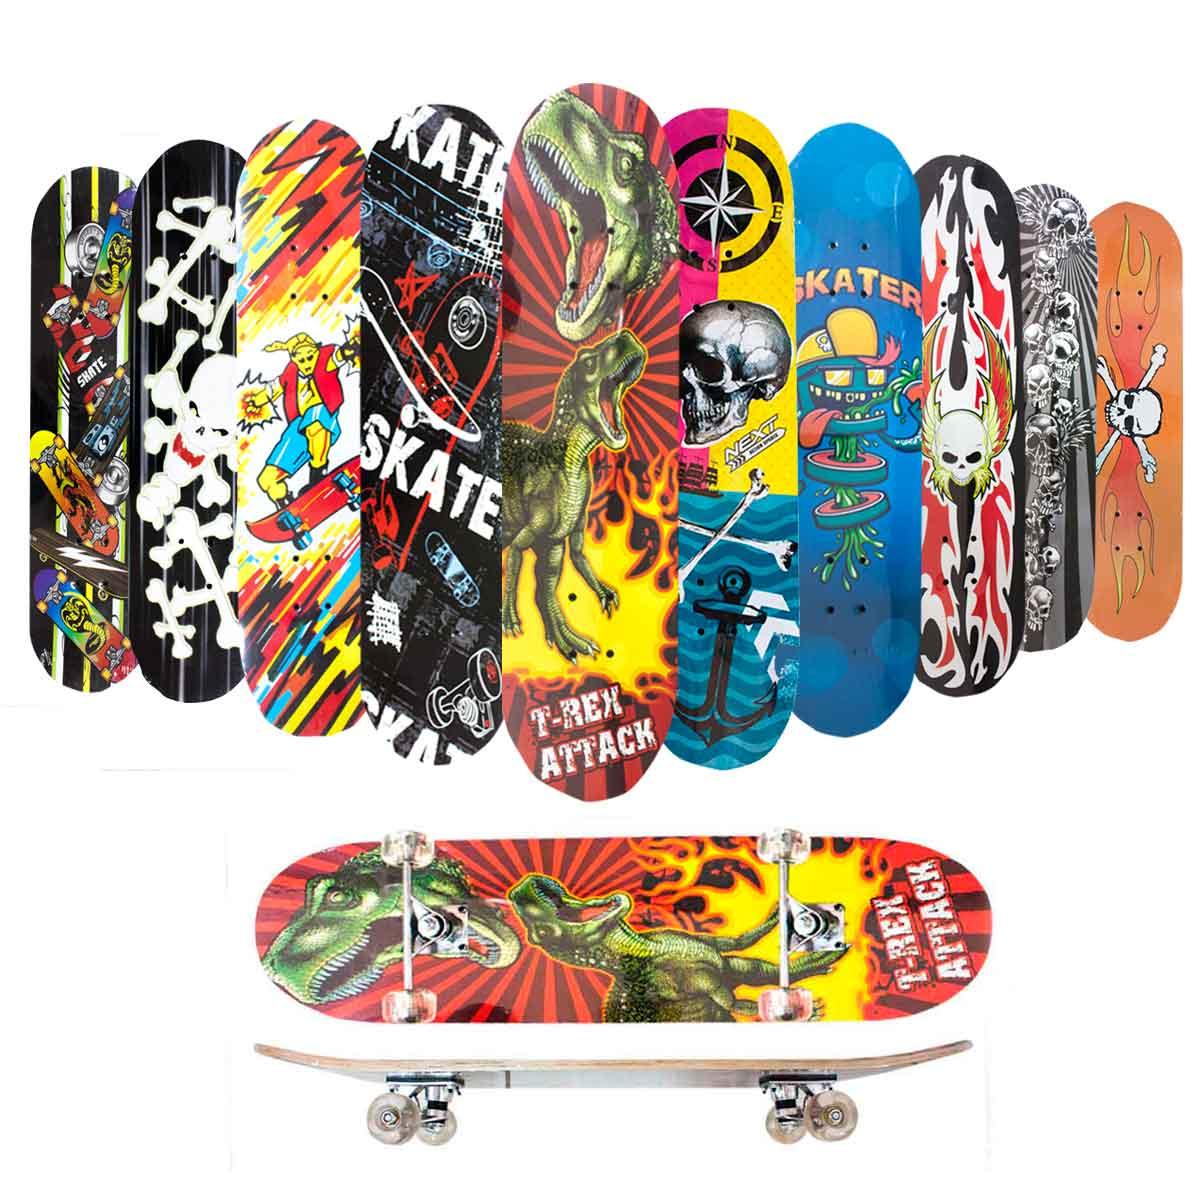 Skate Skateboard Iniciante Completo Madeira Modelos 78 Cm